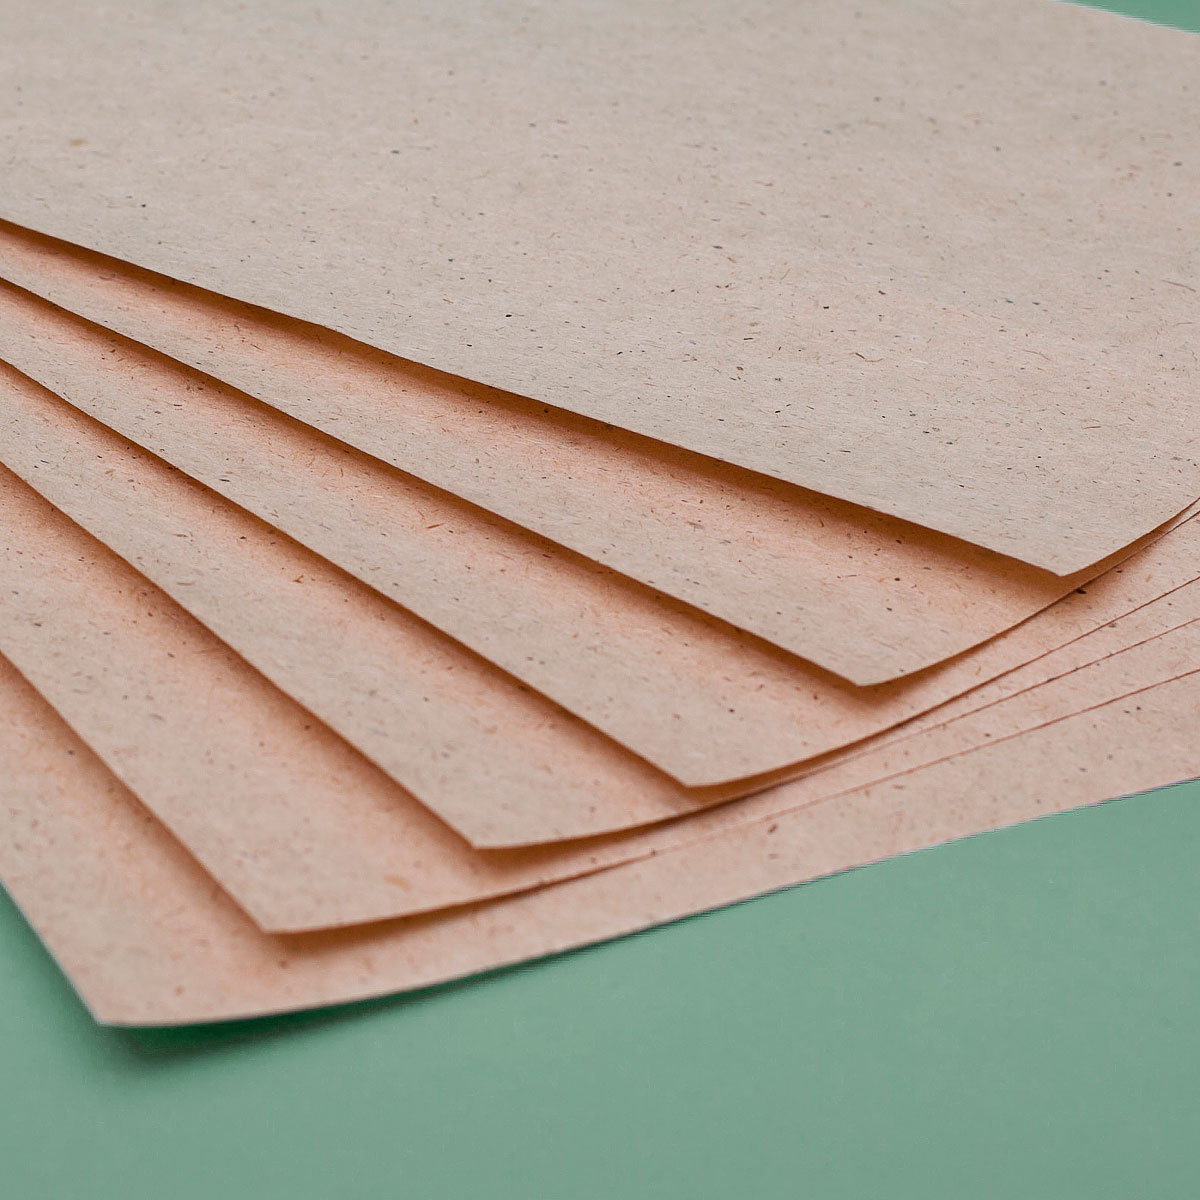 Бумага резаная обёрточная Лальская БФ. Бумага марки Е 60х84